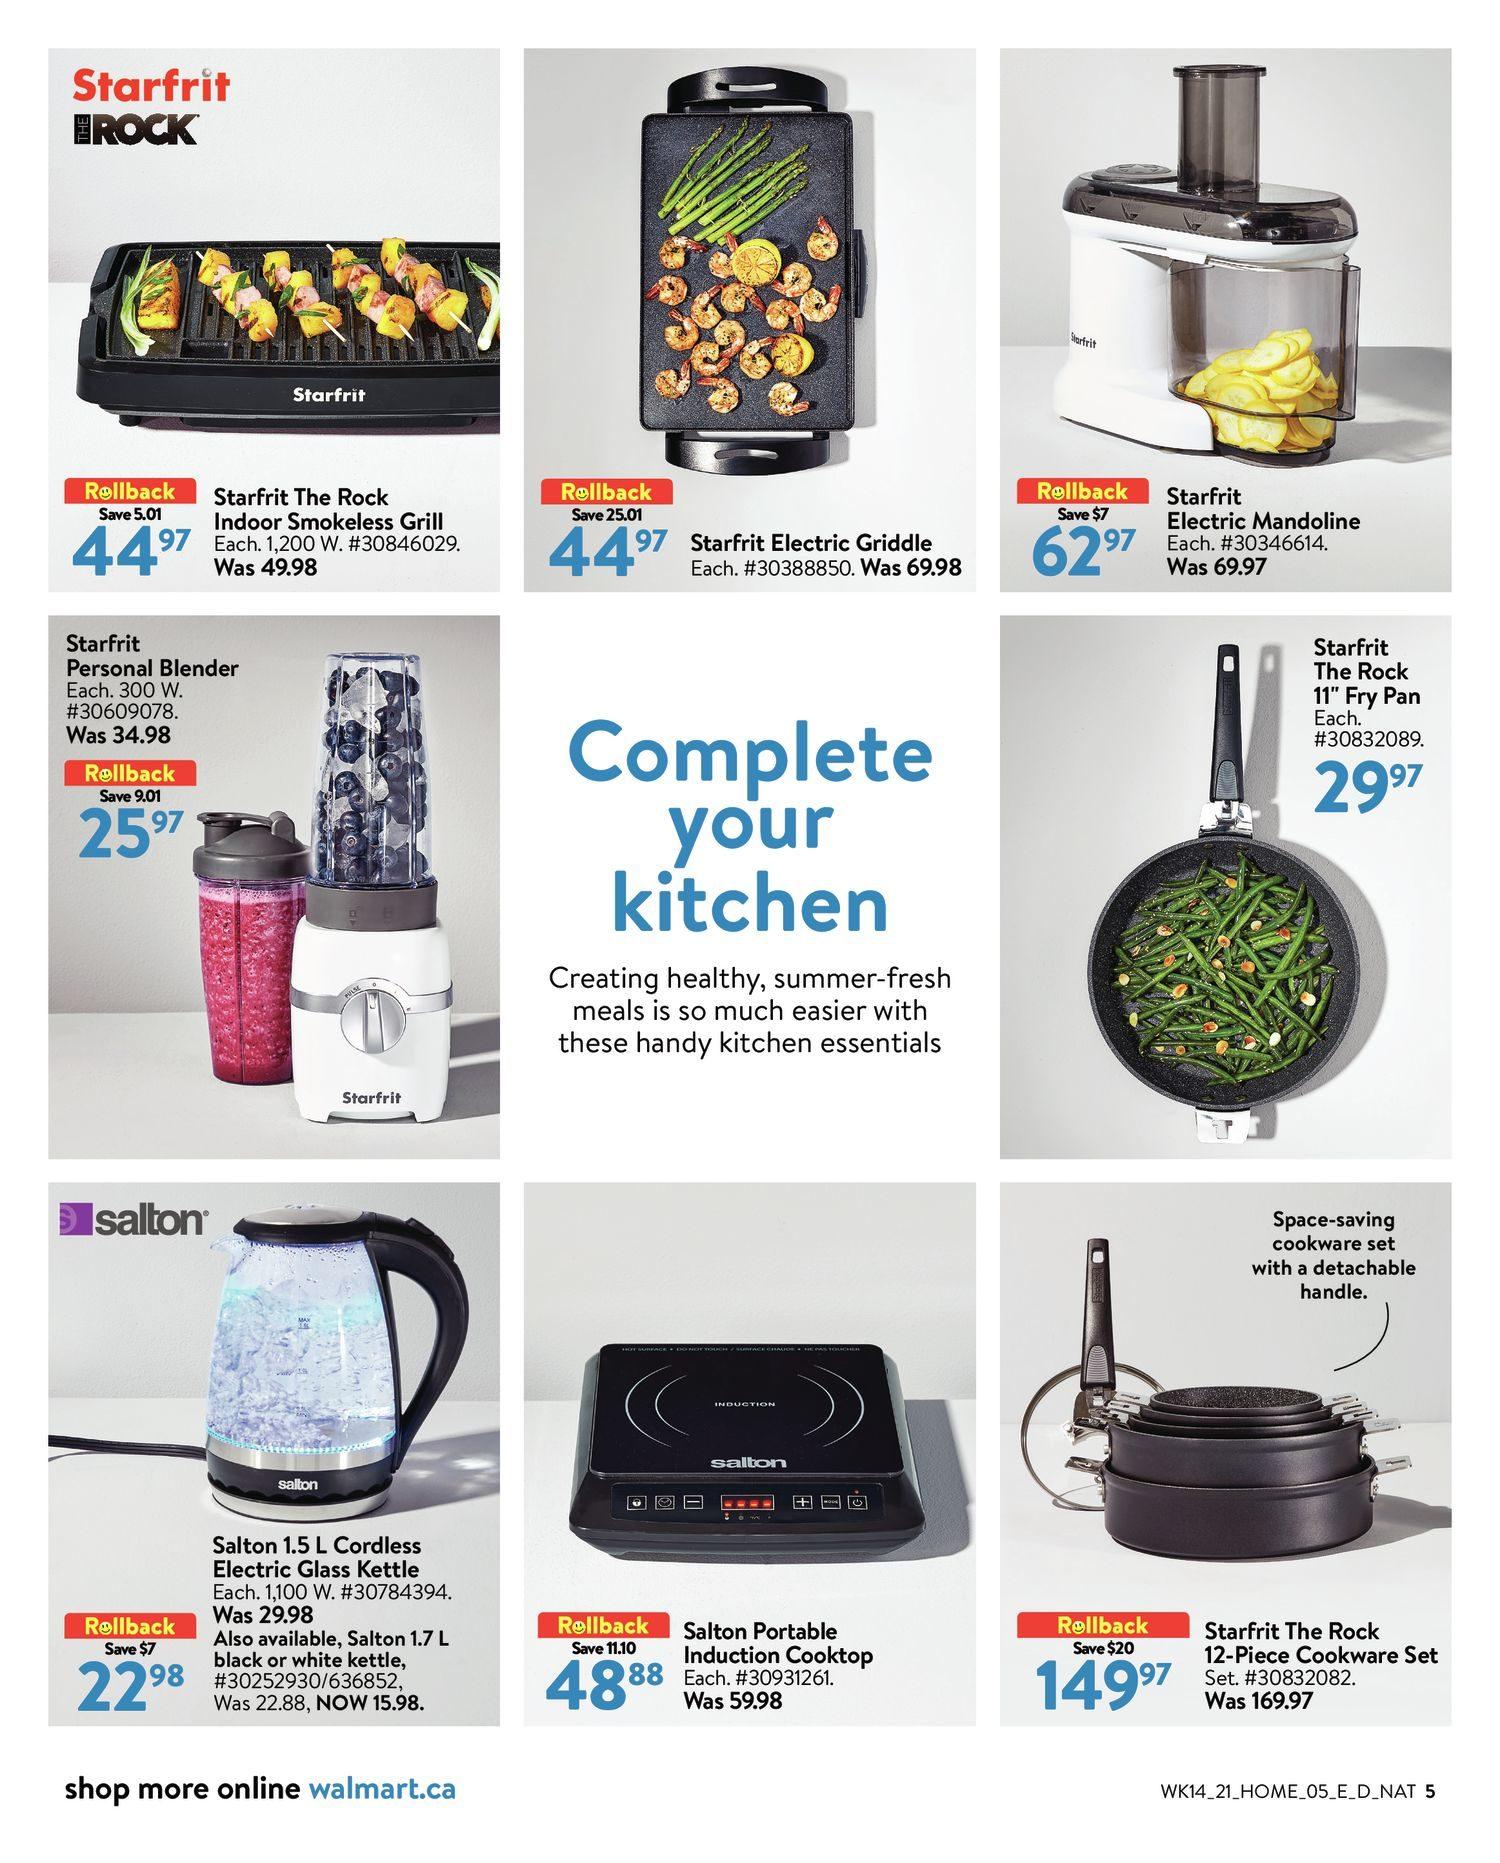 Walmart - Home Book - Page 5